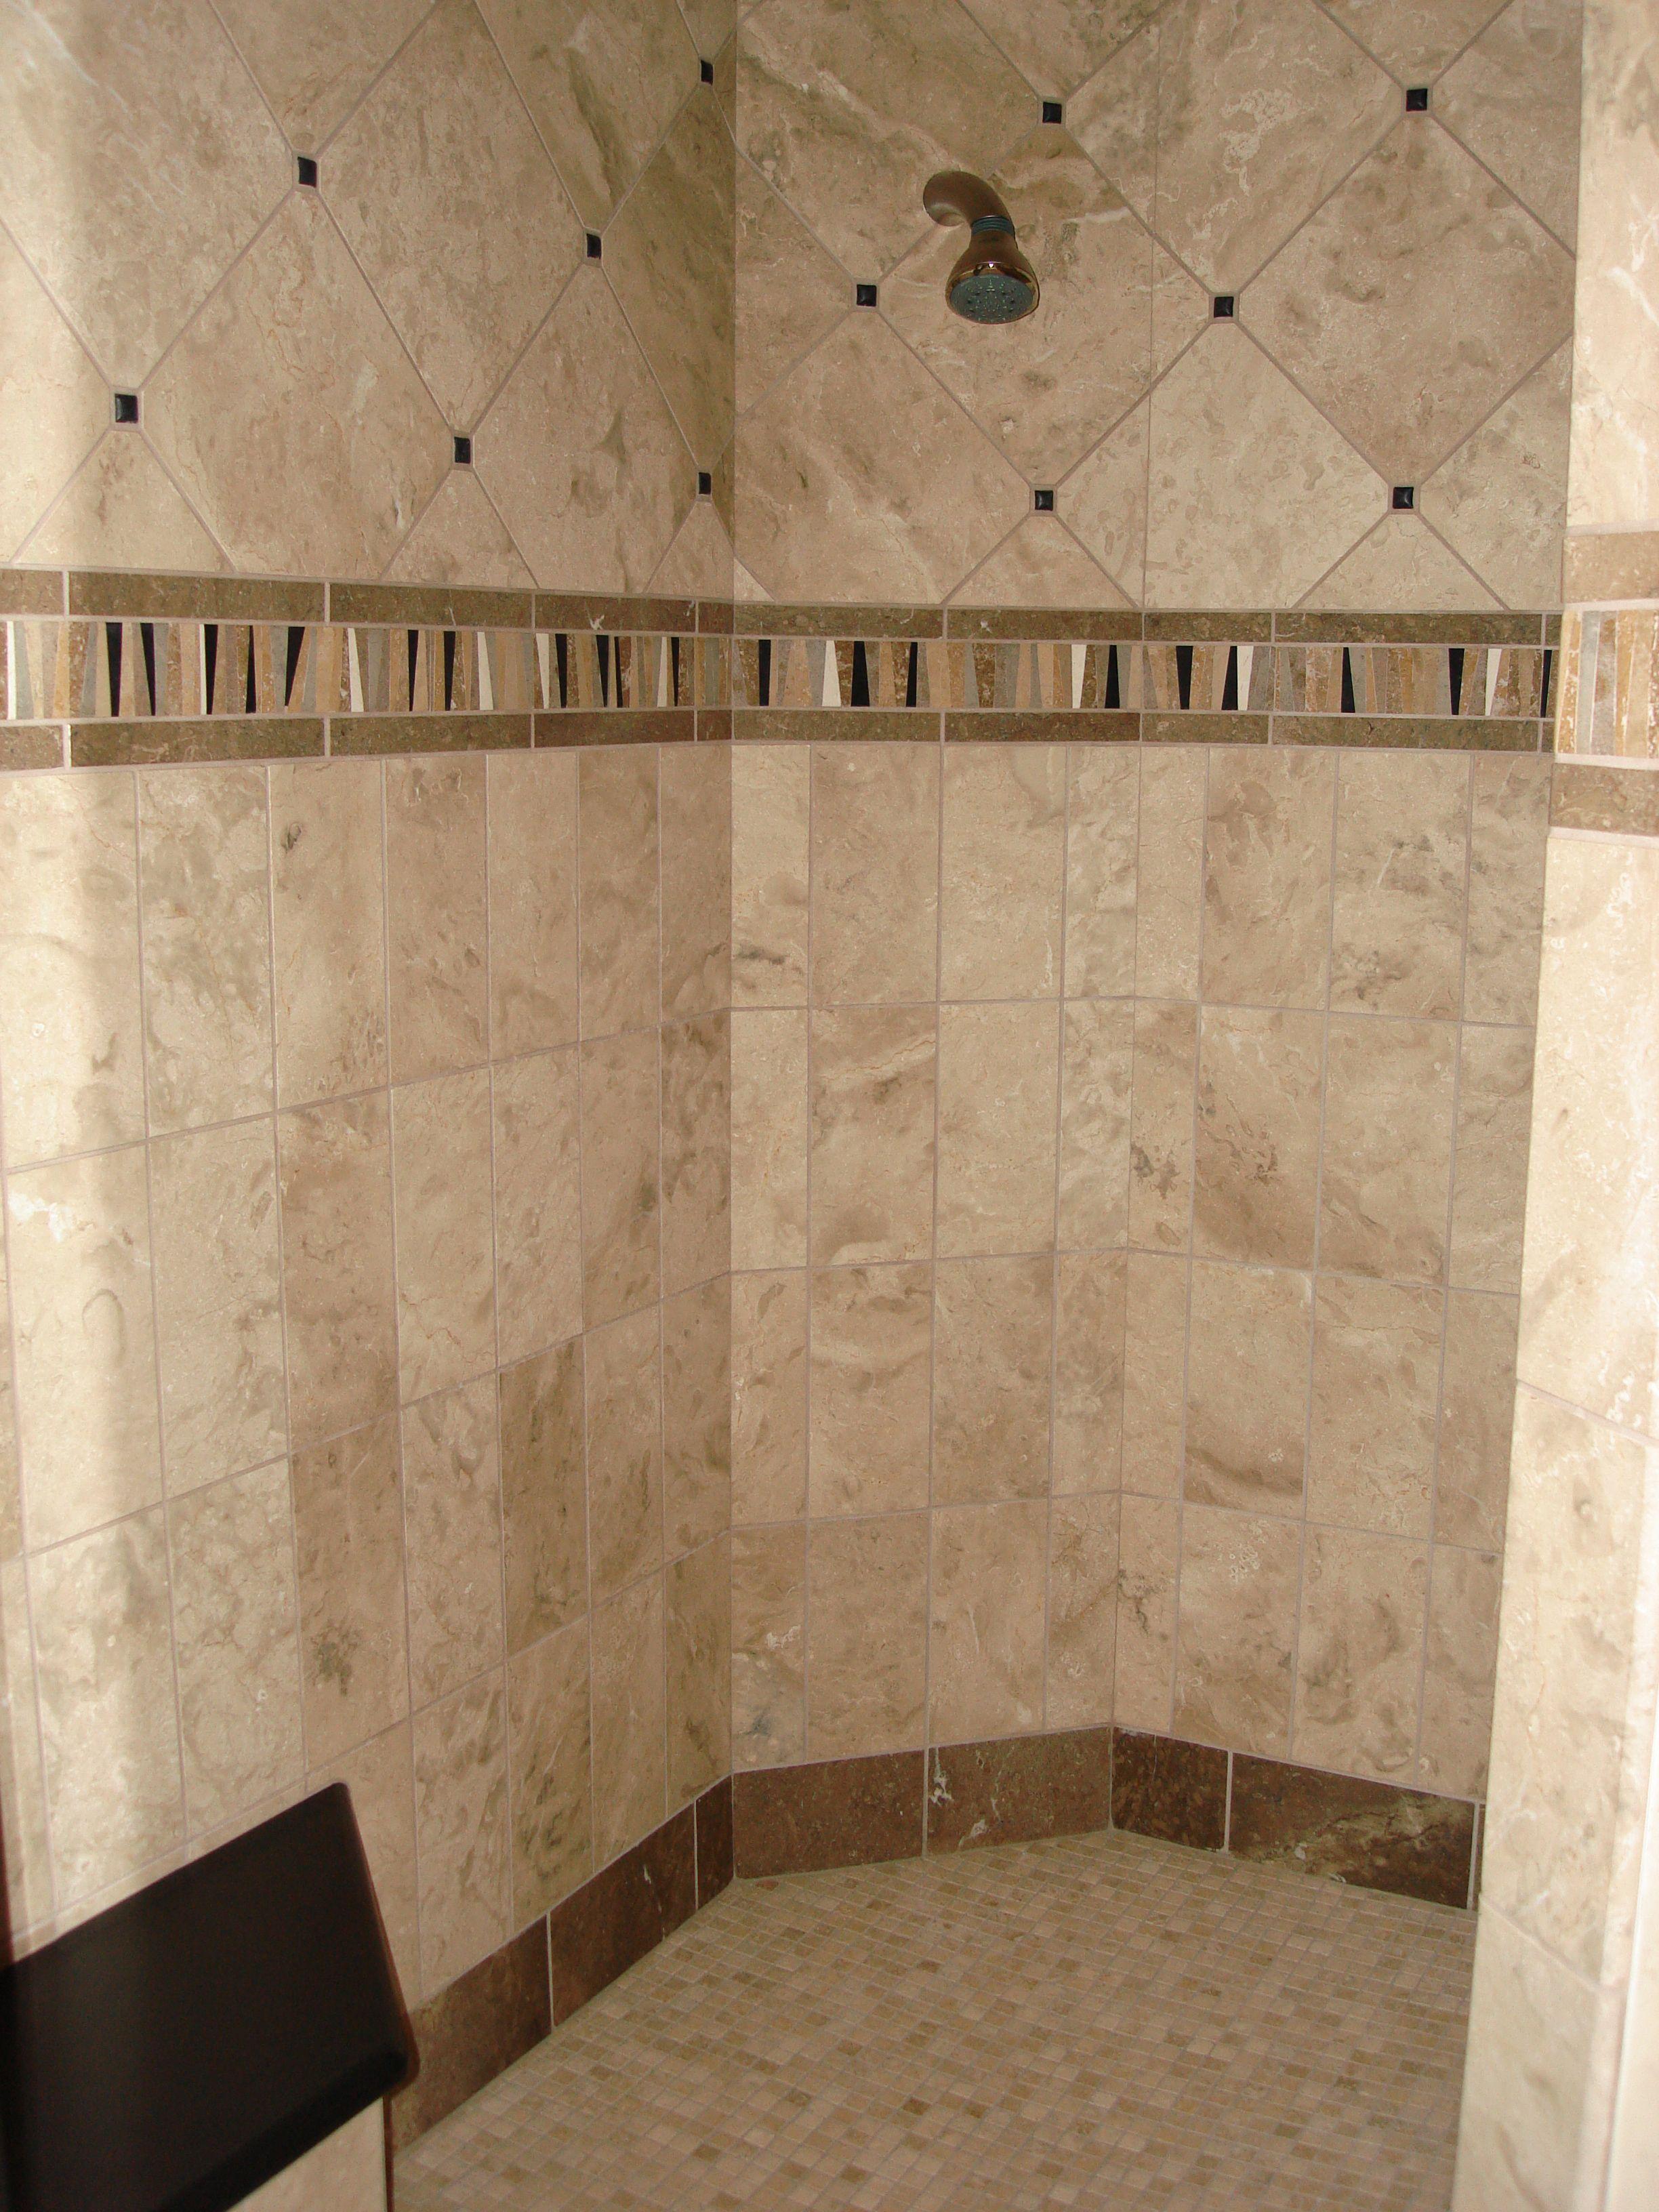 Bathroom Tiles Design Ideas Tile Ideas In Modern Bathroom Designs Bathroom Lovely Bathroom Bathroom Wall Tile Design Shower Tile Subway Tile Shower Designs